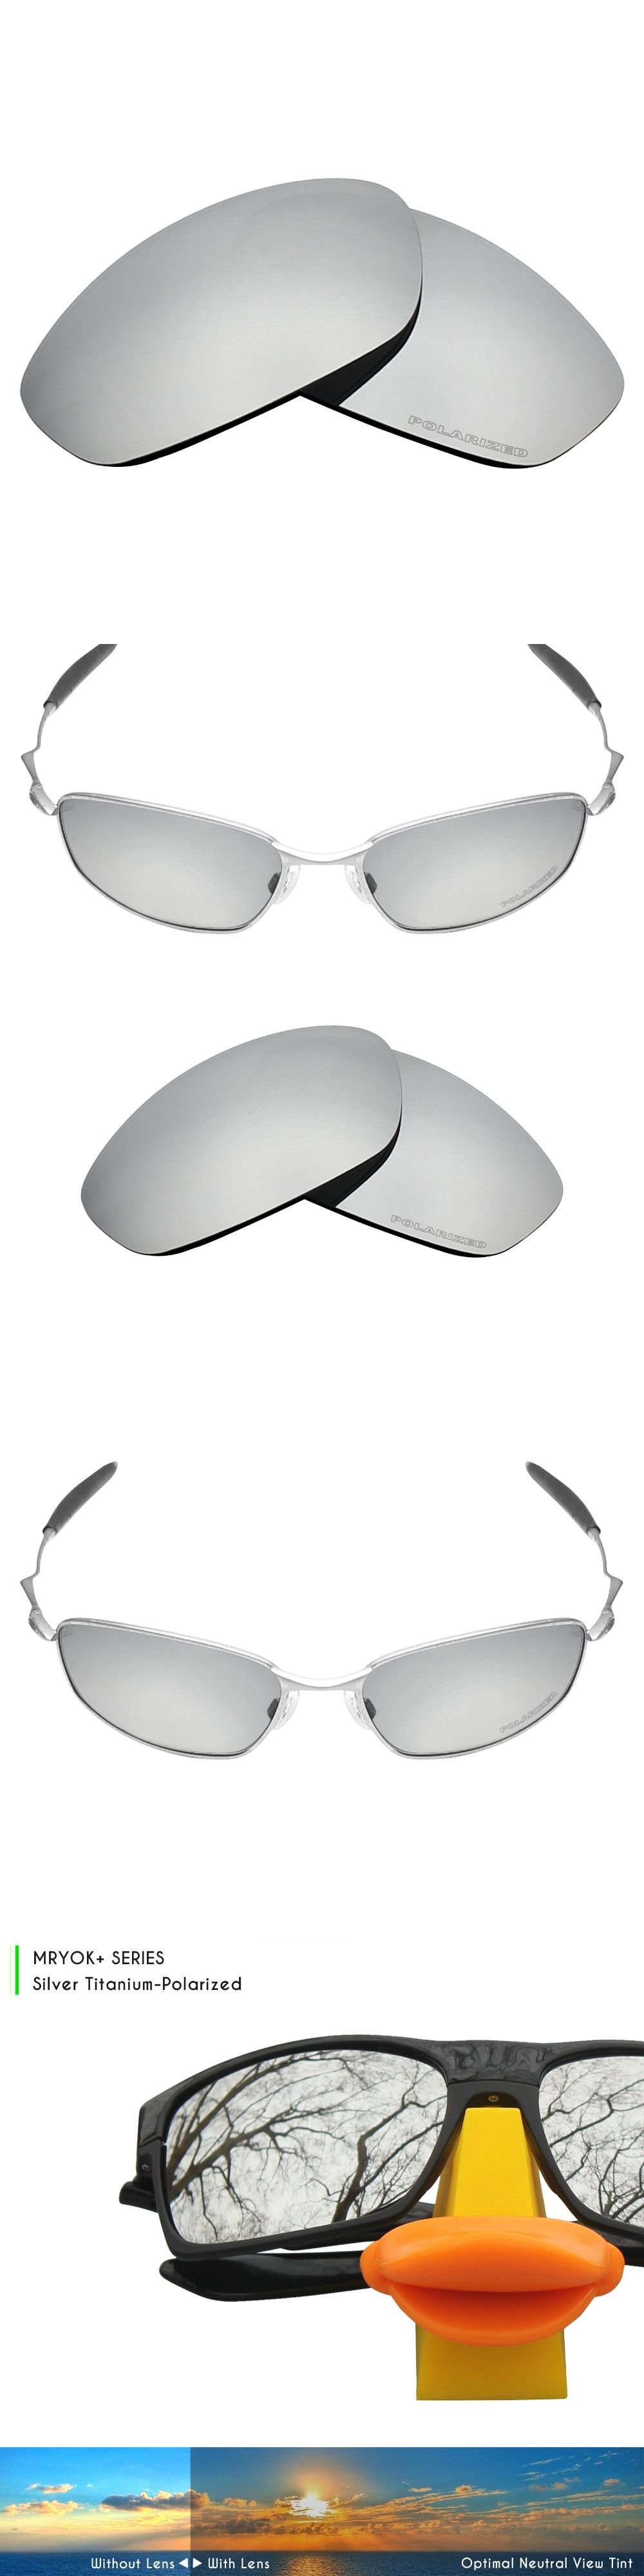 Mryok+ POLARIZED Resist SeaWater Replacement Lenses for Oakley Whisker  Sunglasses Bronze Brown ad8bd41e515e